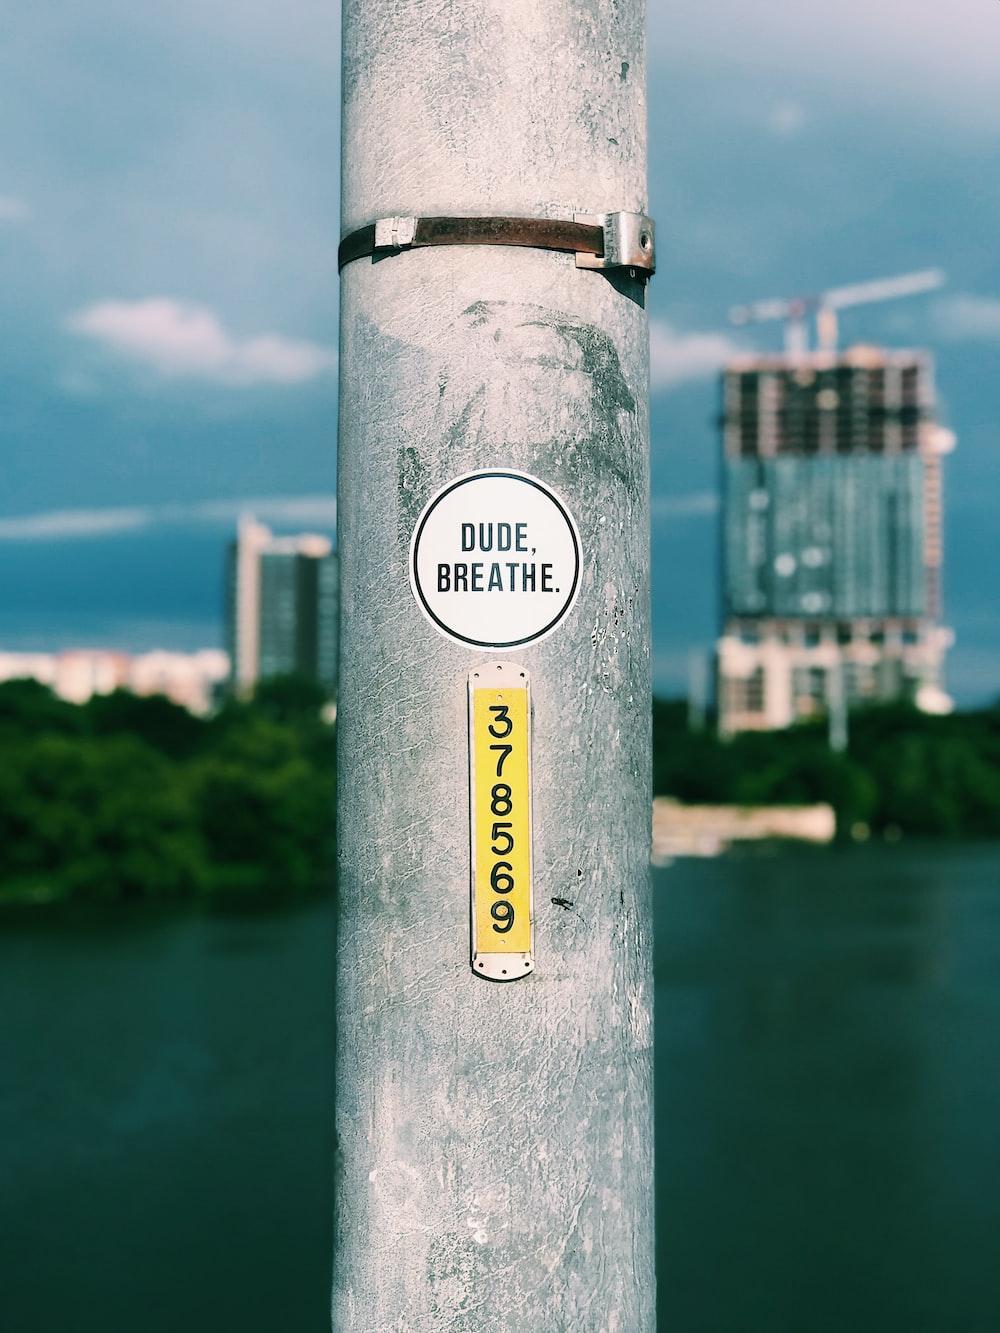 dude breathe sticker on gray post